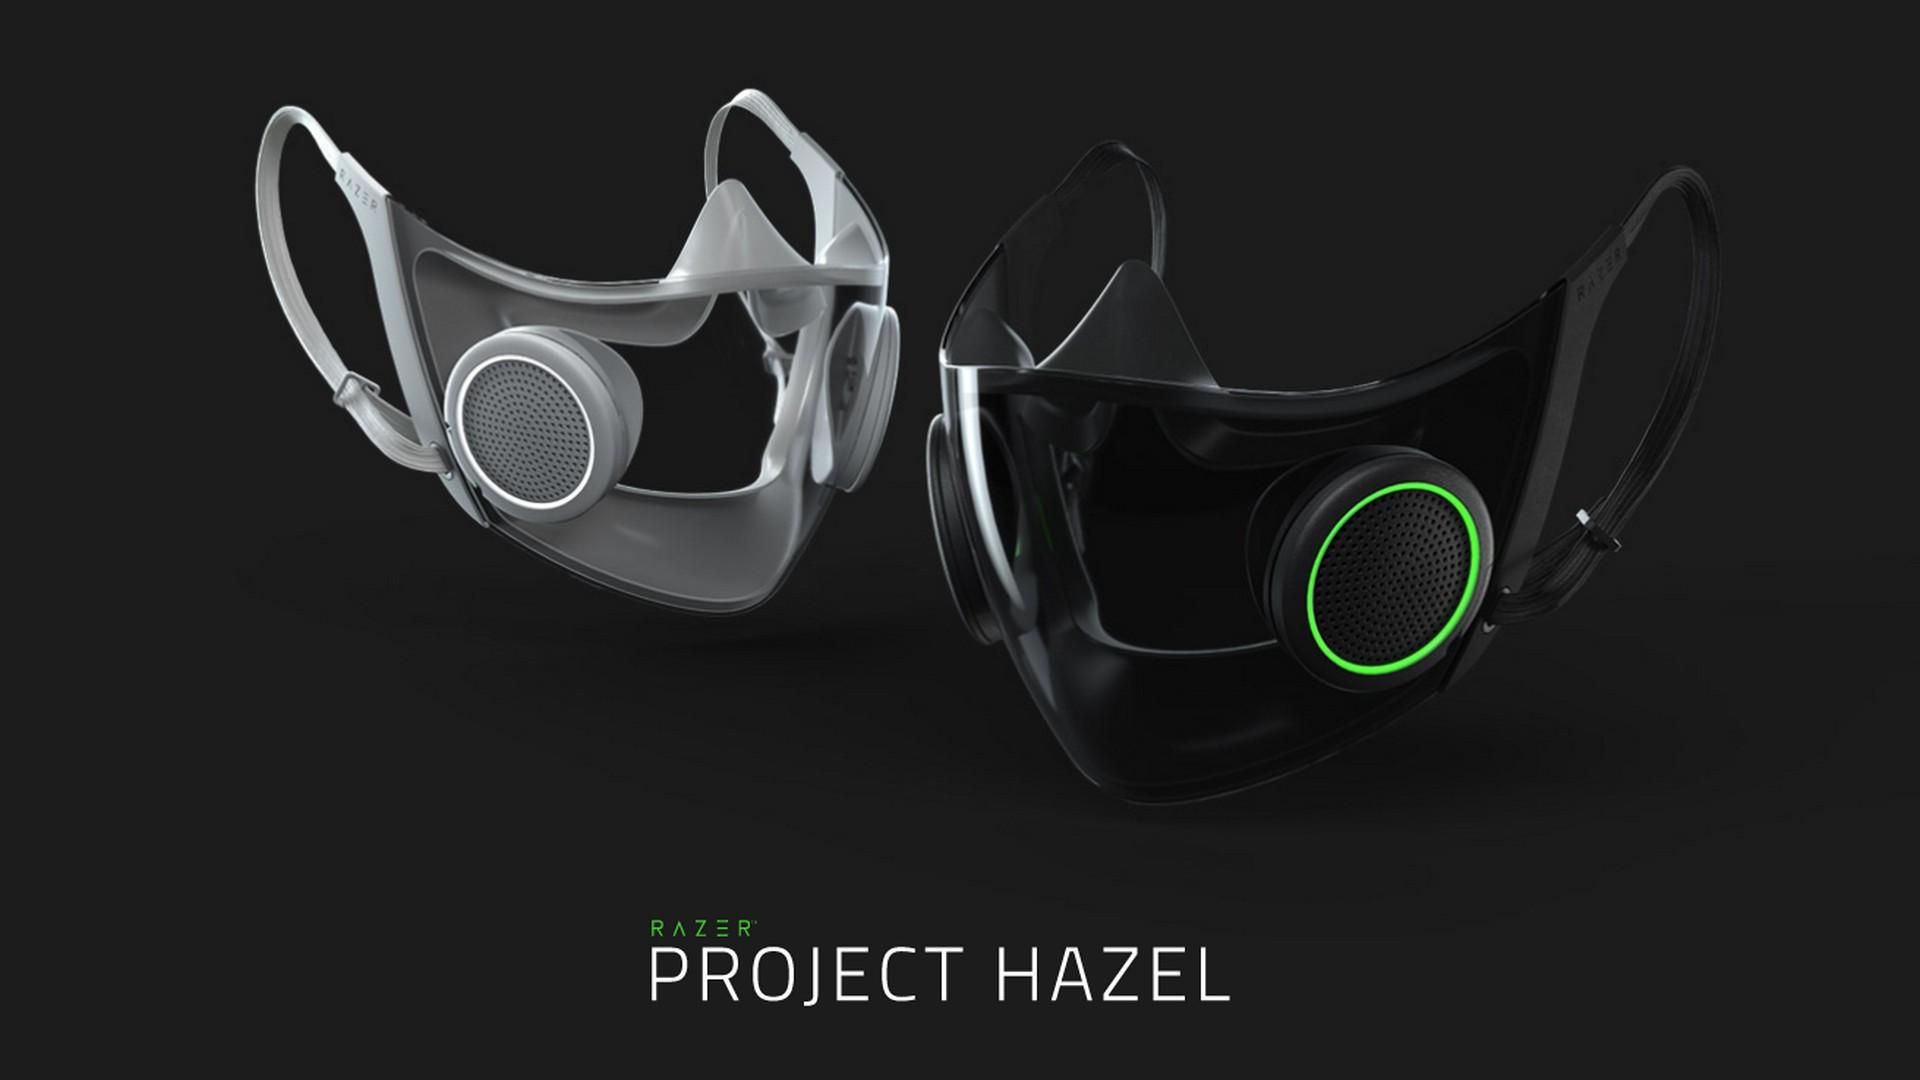 Razer Unveils Project Hazel, The Worlds Smartest Mask